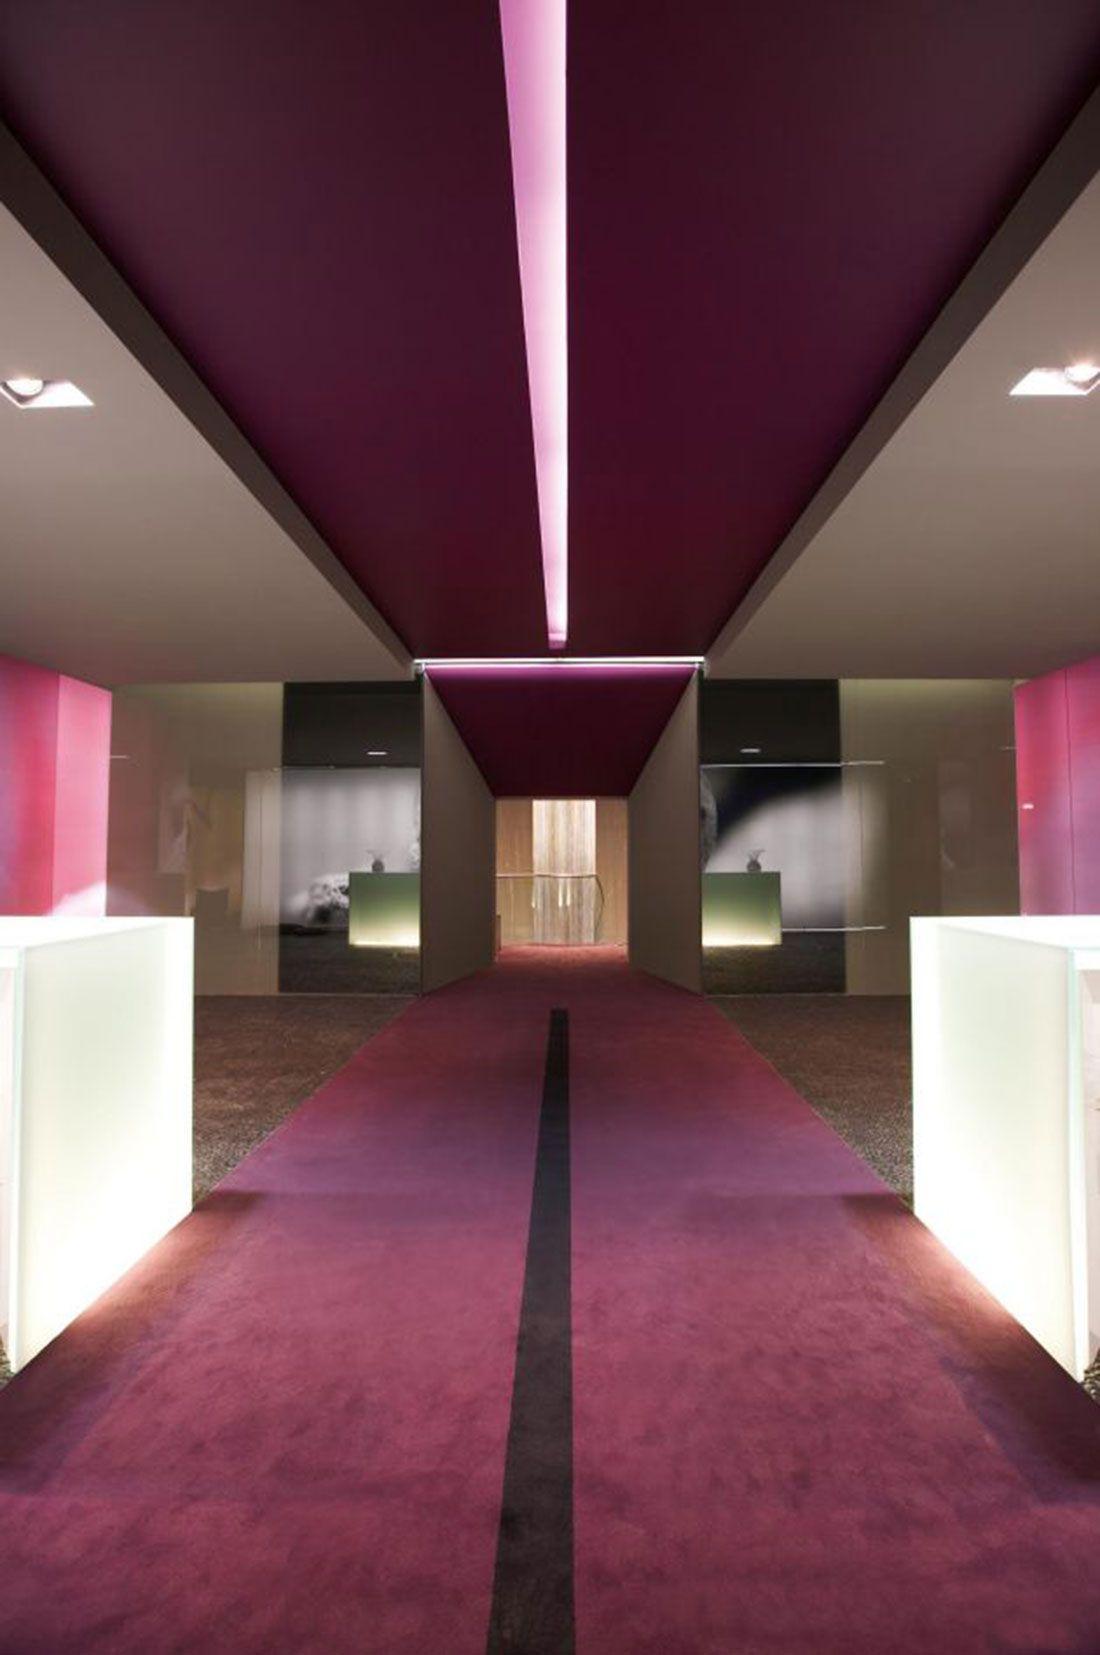 hotel interior arcetexture vine hotel interior design zeospotcom zeospotcom